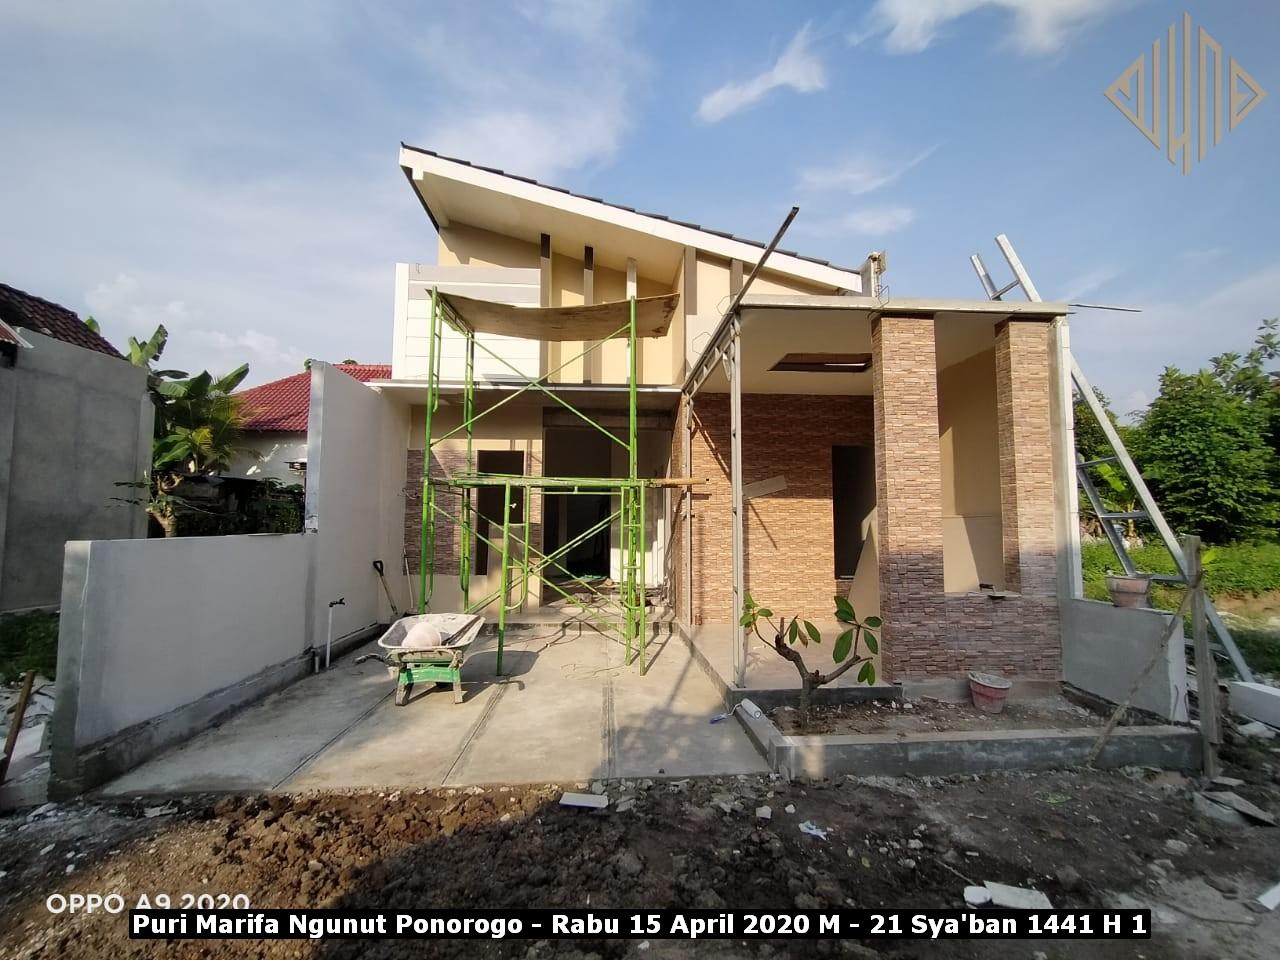 Puri Marifa Ngunut Ponorogo - Rabu 15 April 2020 M - 21 Sya'ban 1441 H - AlexandriaPropertyAgency.com